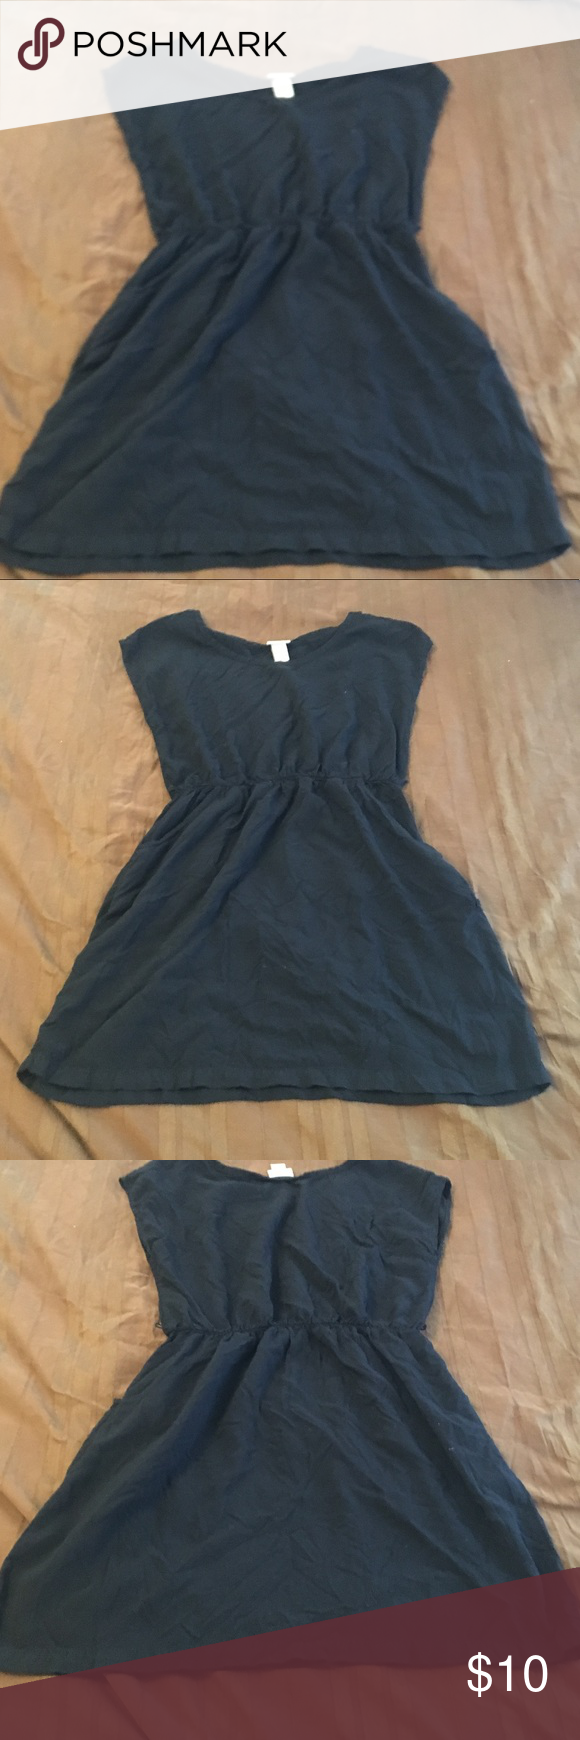 cb6d2752c58d1 Mossimo Mini Dress Mossimo Mini Dress. Black short sleeve mini dress with  pockets Mossimo Supply Co. Dresses Mini